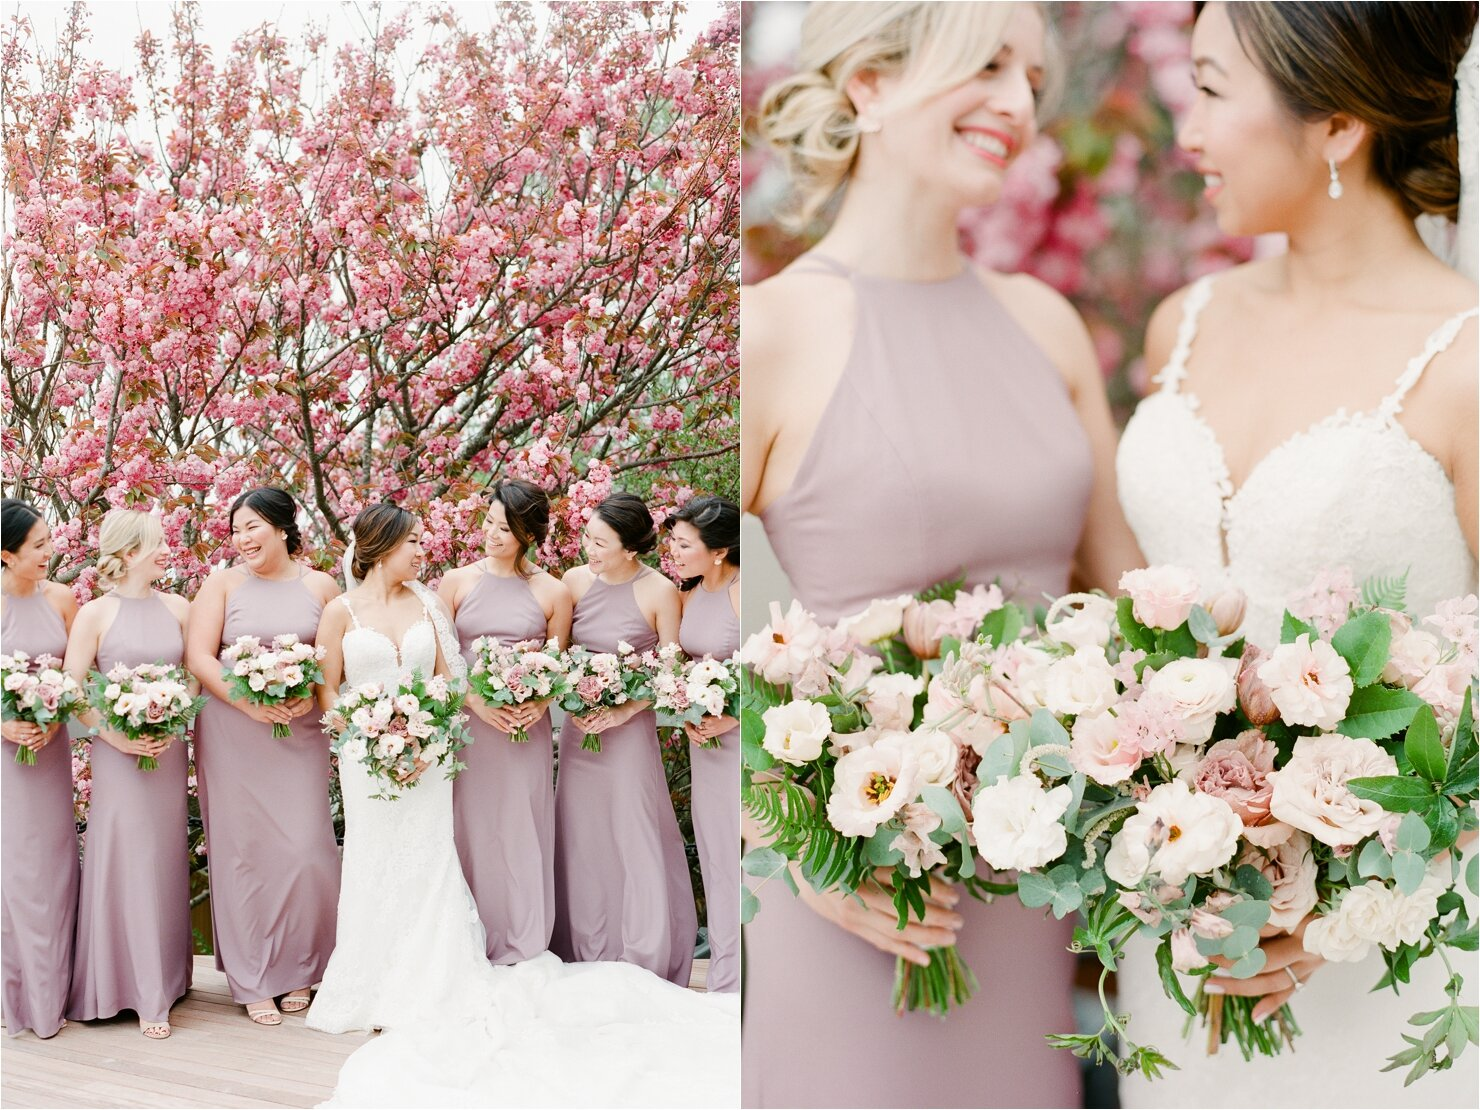 Lavender Bridesmaids Dresses at Gurney's Montauk